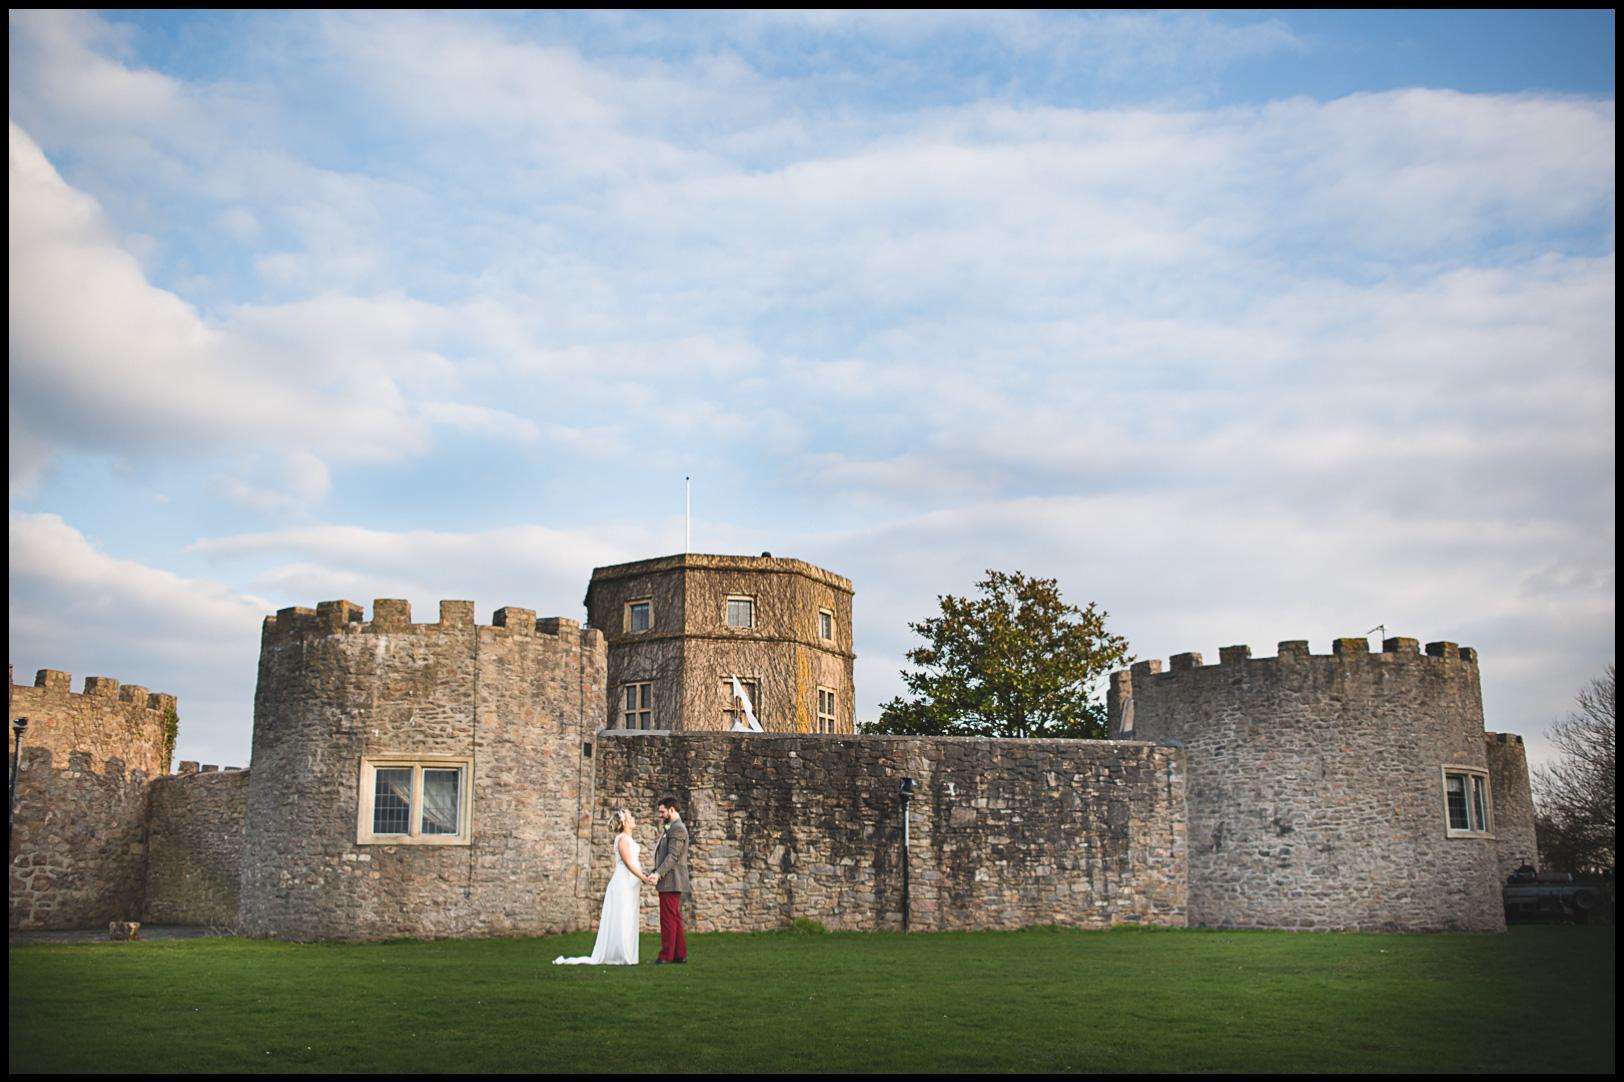 walton-castle-wedding-photography.jpg